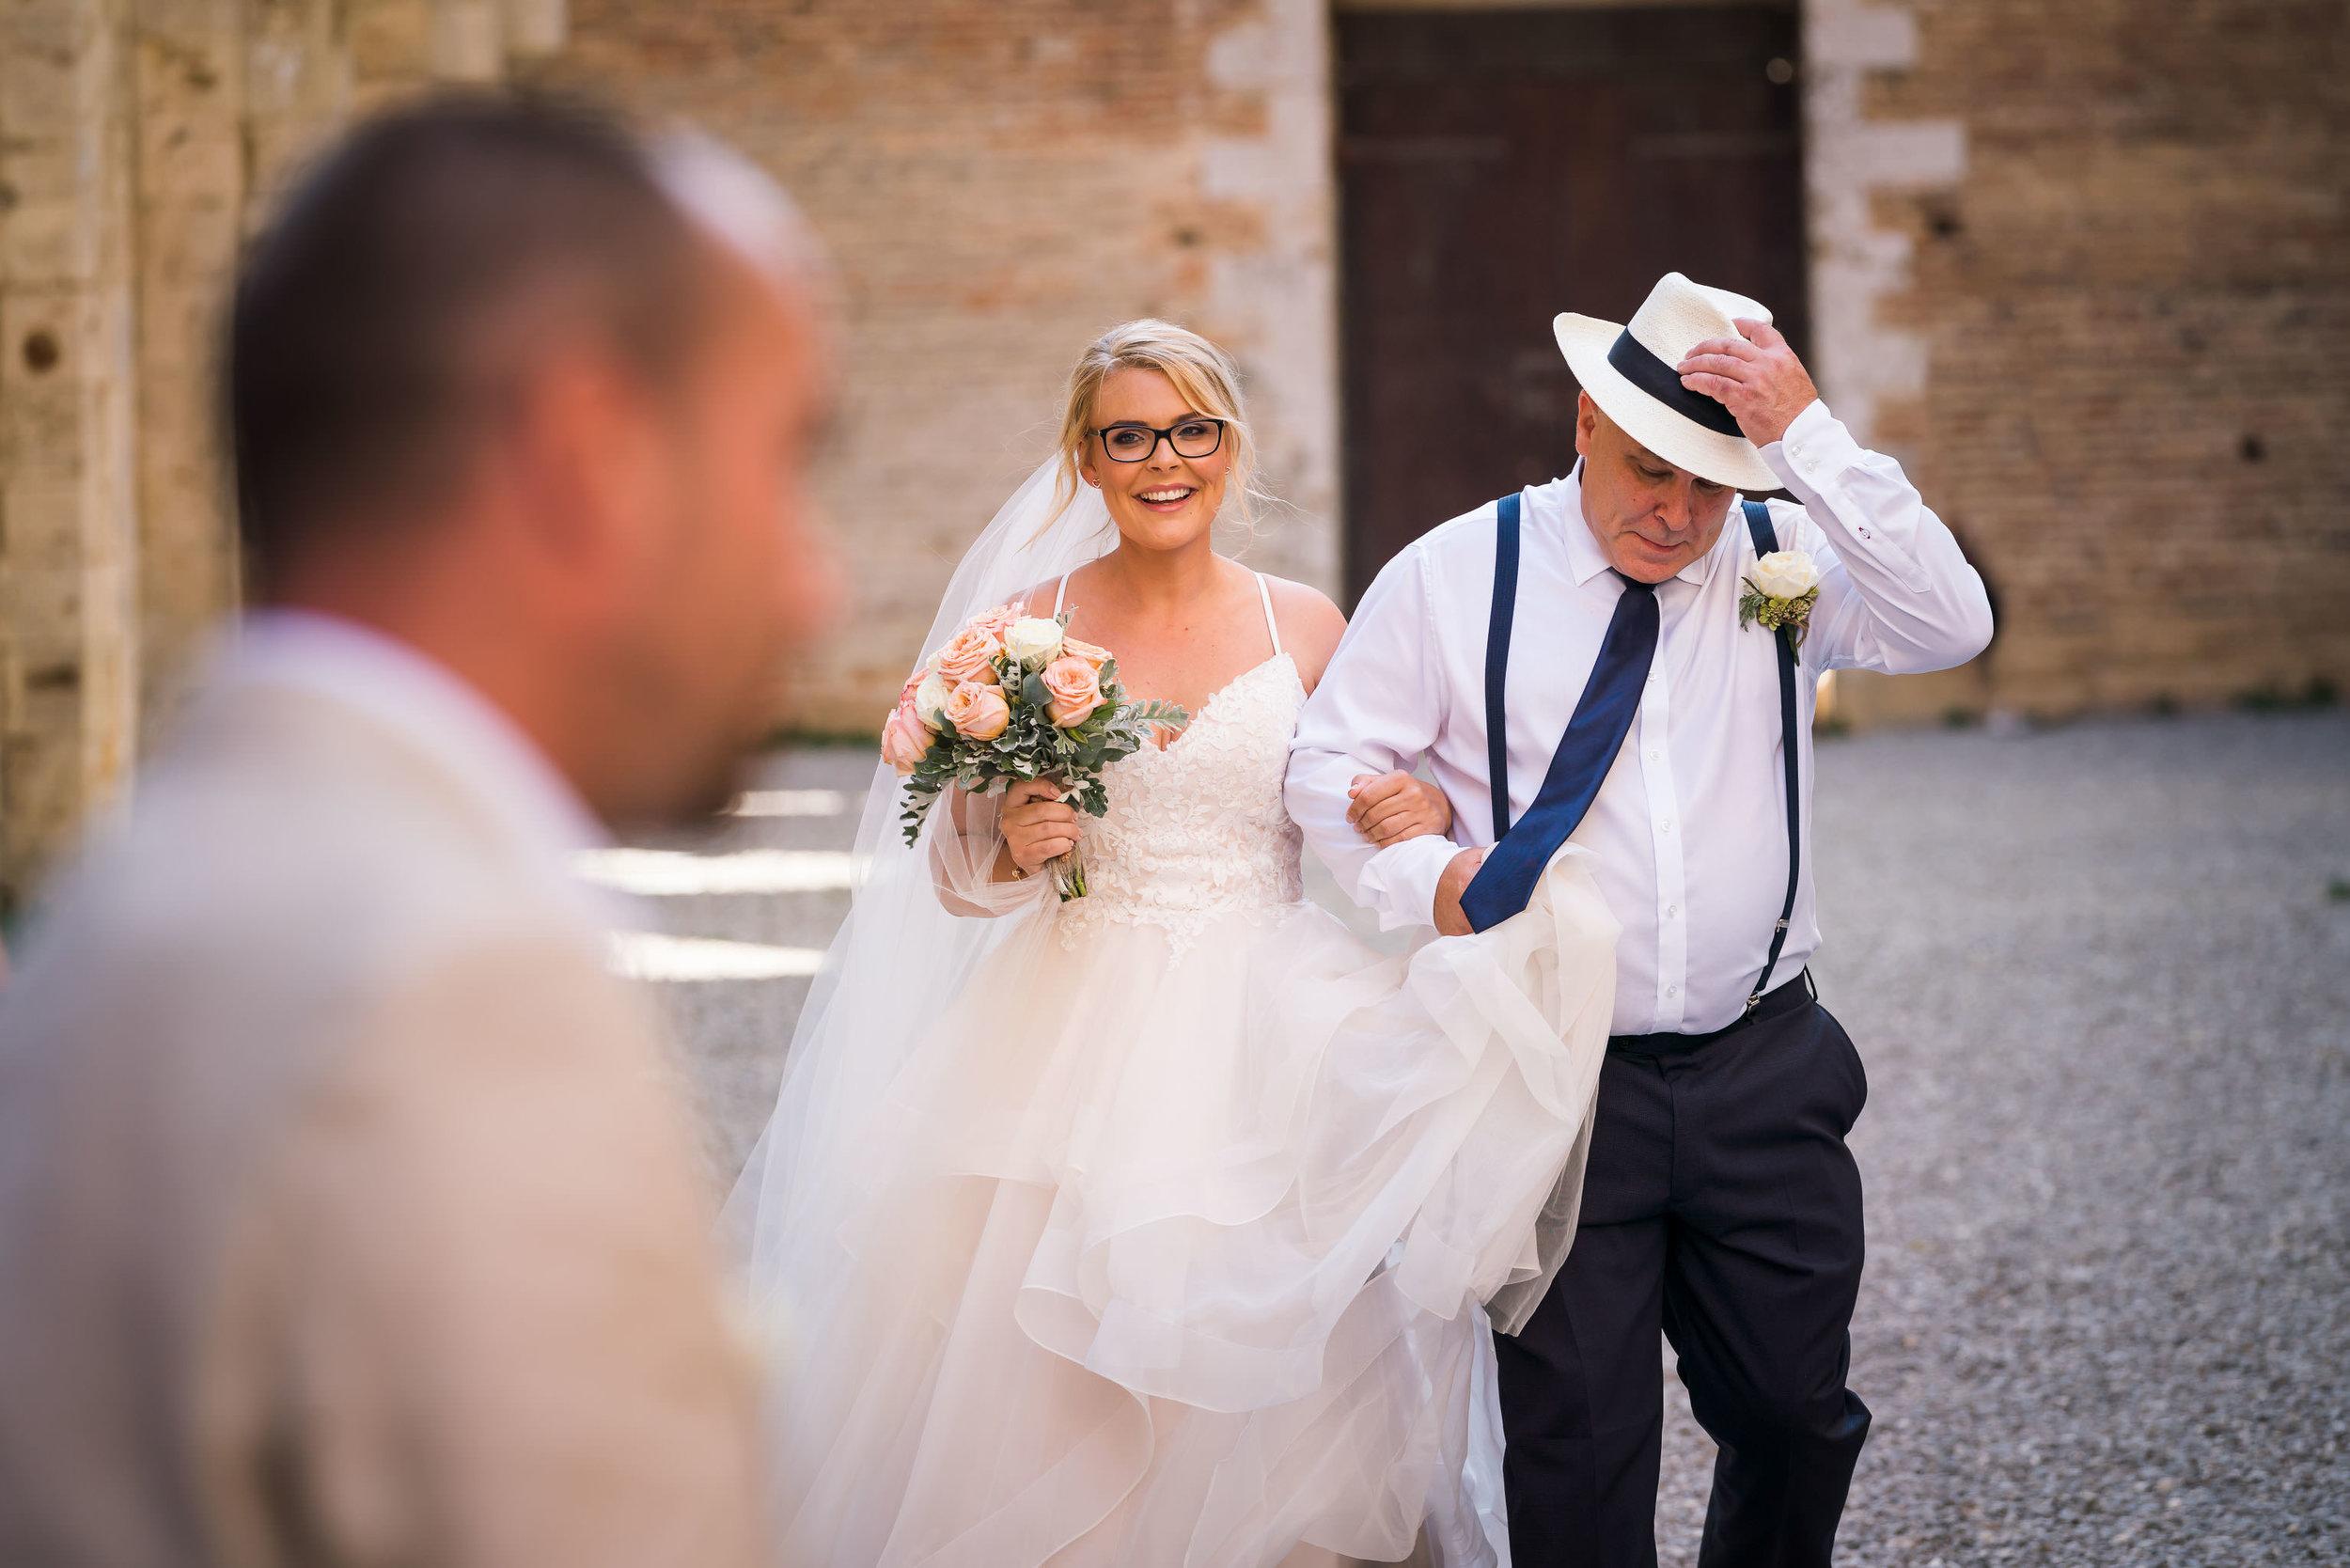 Destination wedding, destination wedding photographer, destination wedding photography, san galgano, Tuscany wedding, Italian wedding, Italy wedding, weddings abroad, wedding abroad, European wedding, destination wedding photography review, wedding photography review